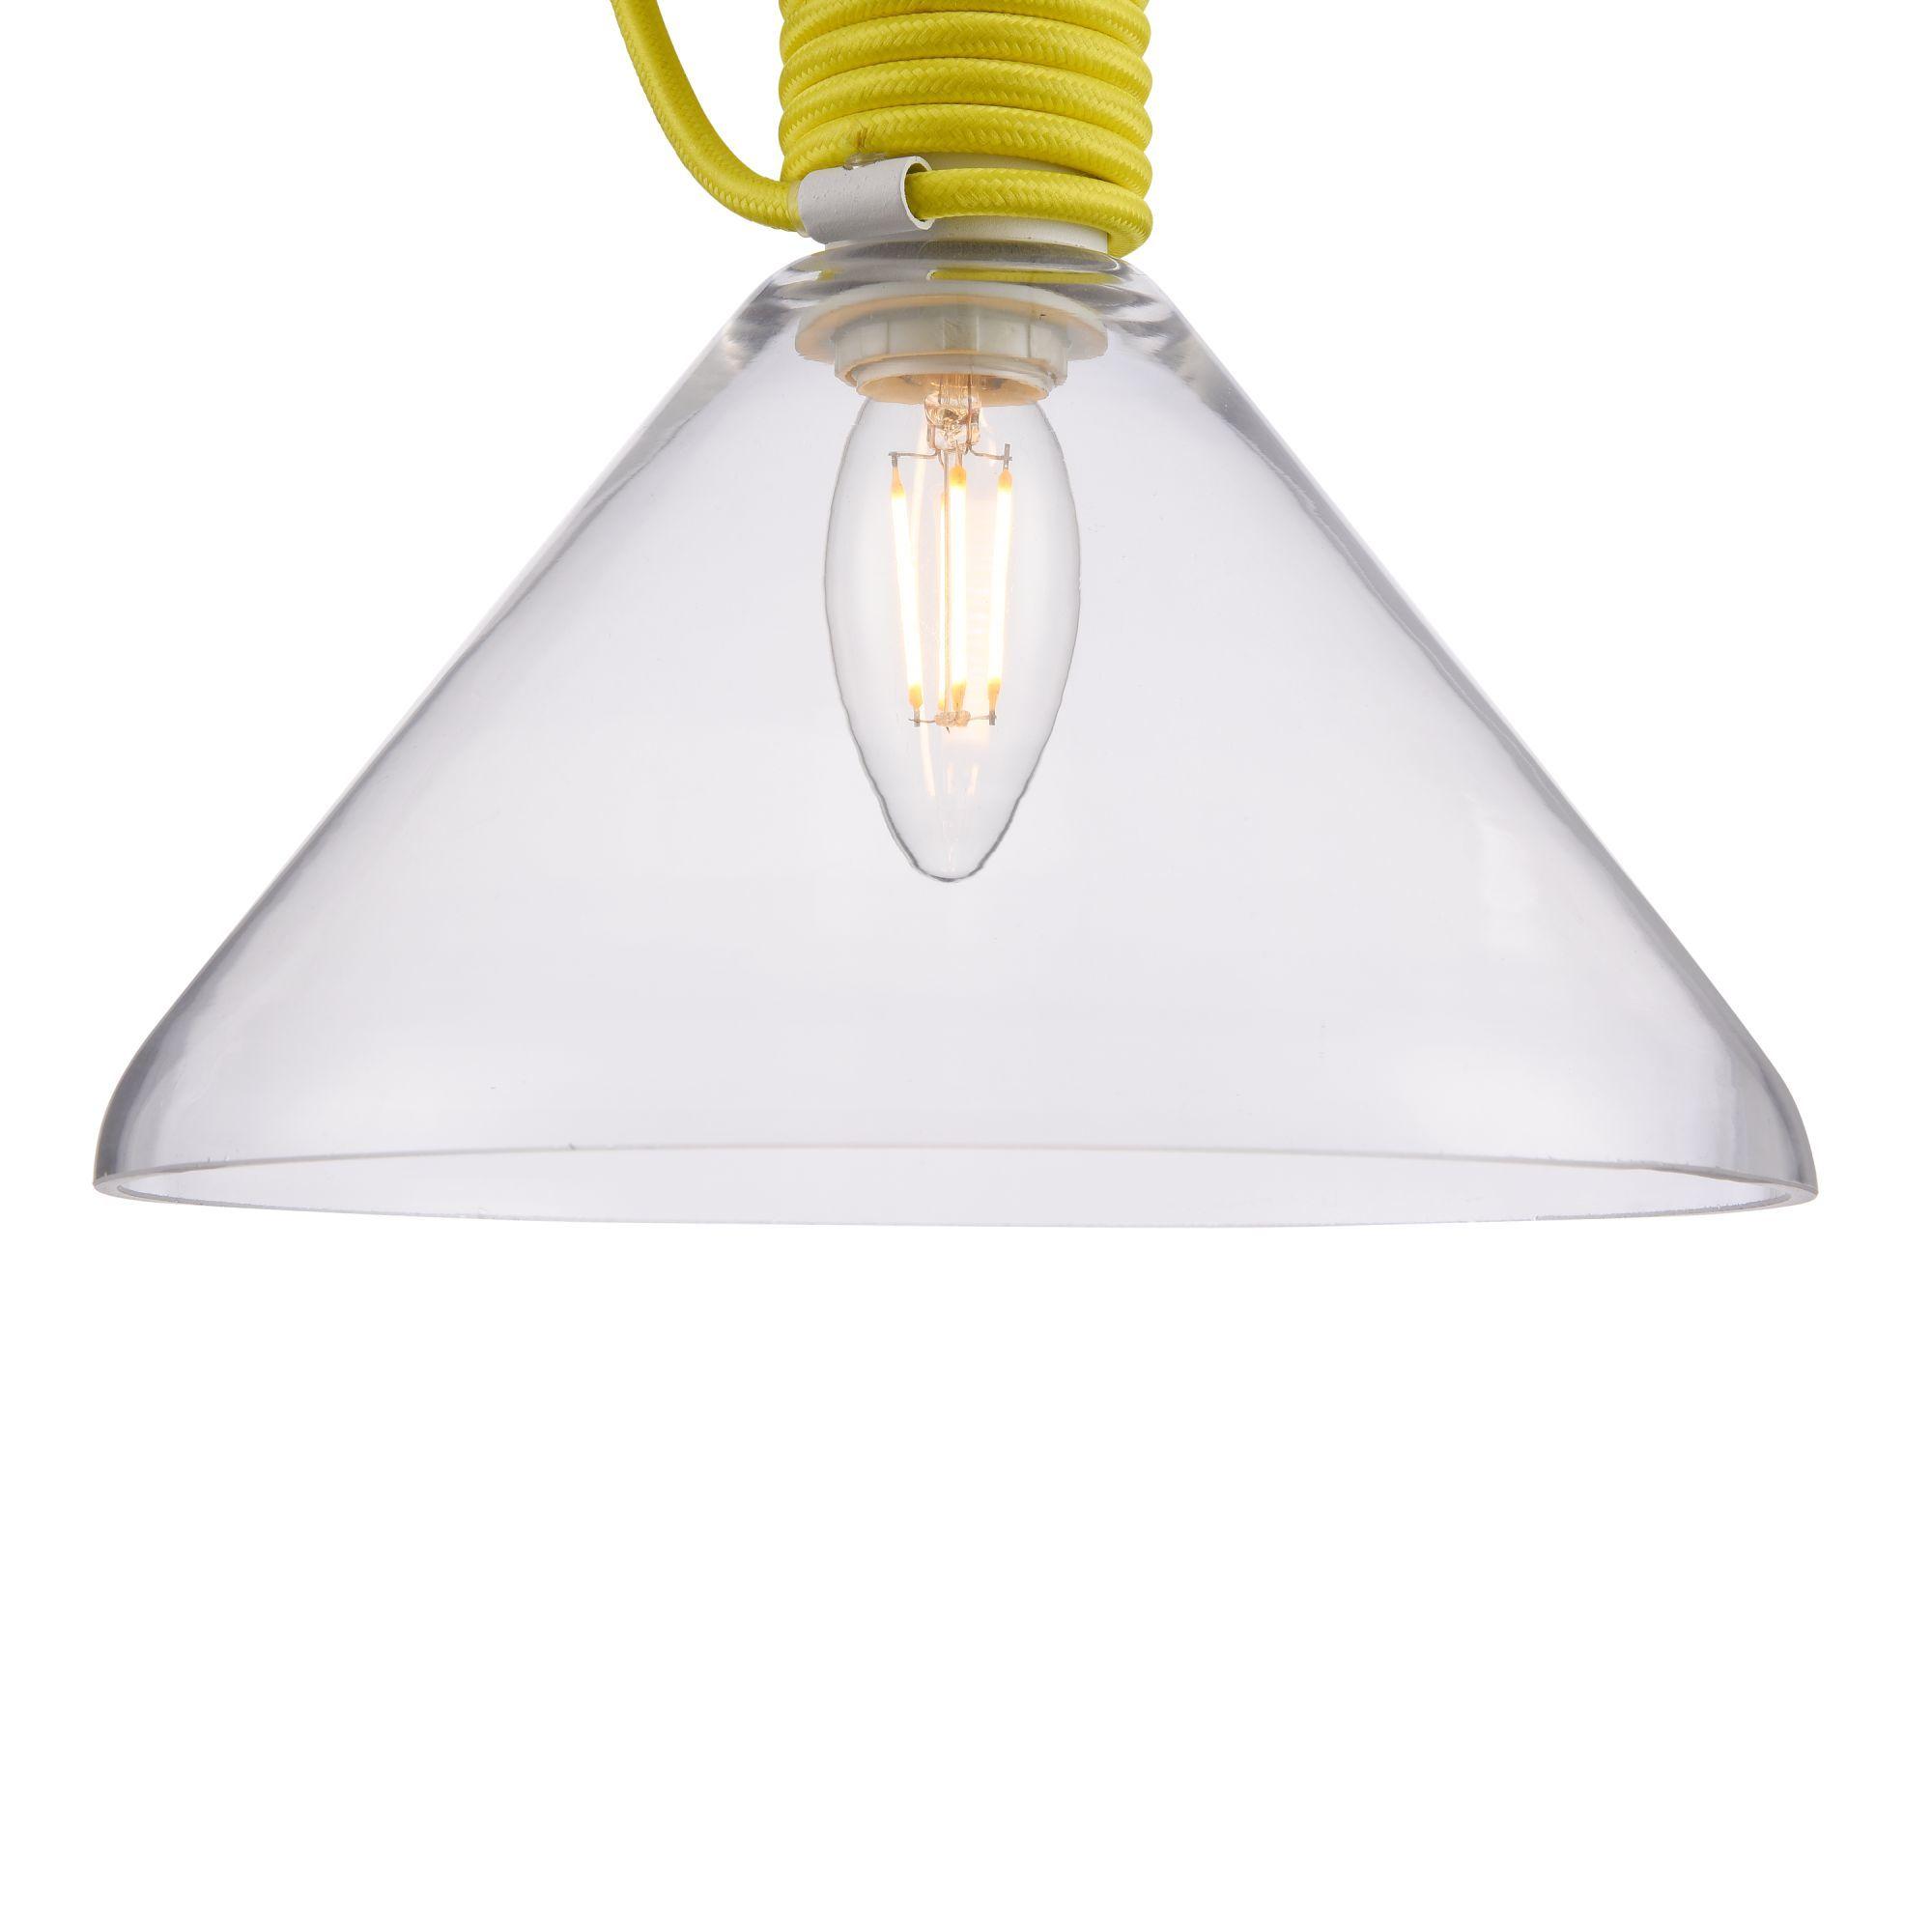 Подвесной светильник Maytoni Modern California P536PL-01YW, 1xE14x40W, белый, желтый, прозрачный, металл, стекло - фото 10